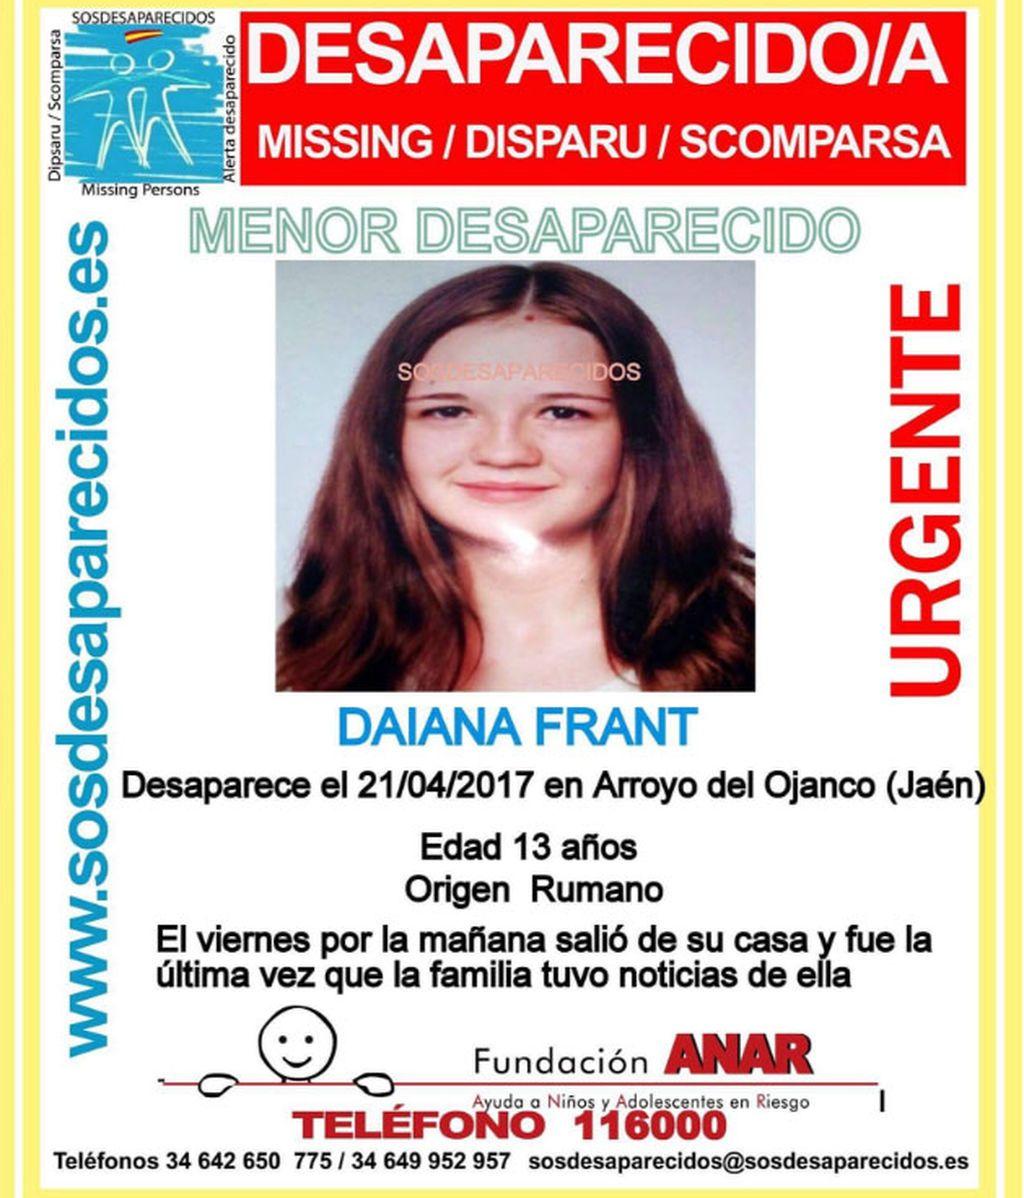 Daiana Frant desaparecida-jaen